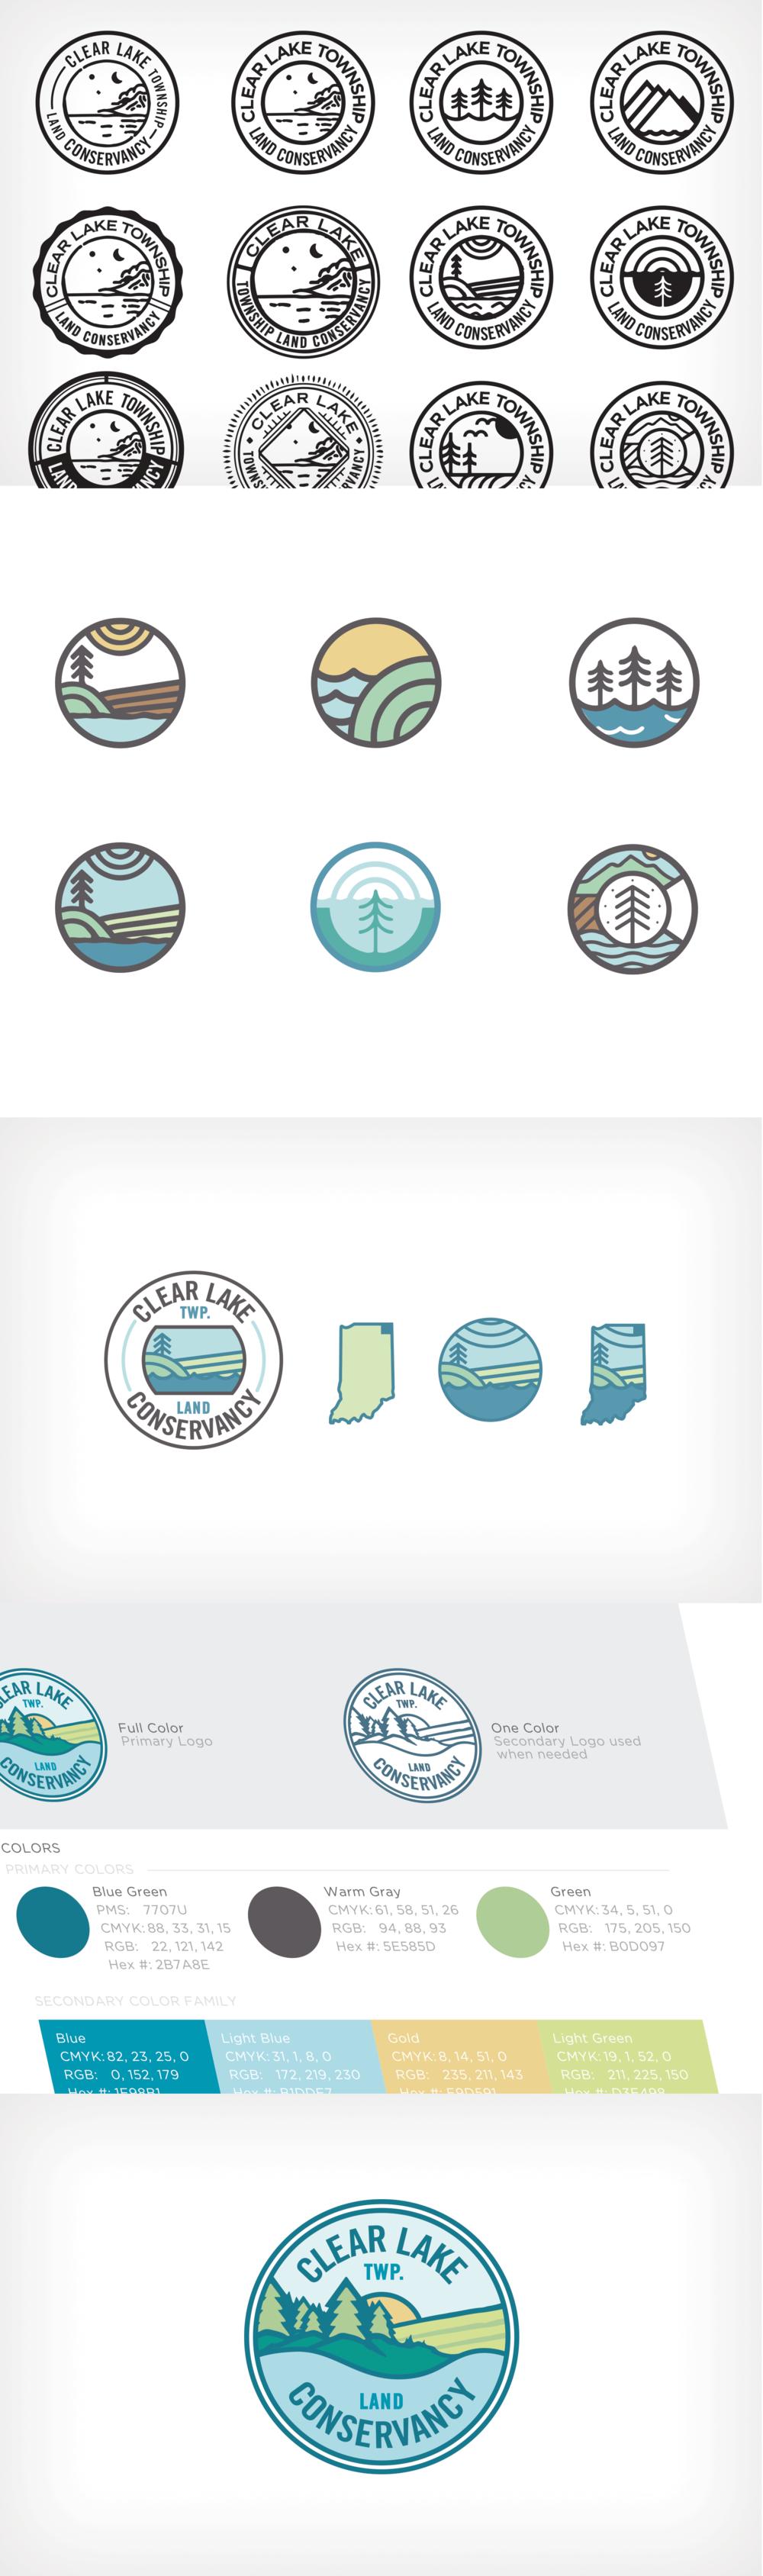 Logos_CLTLC.png